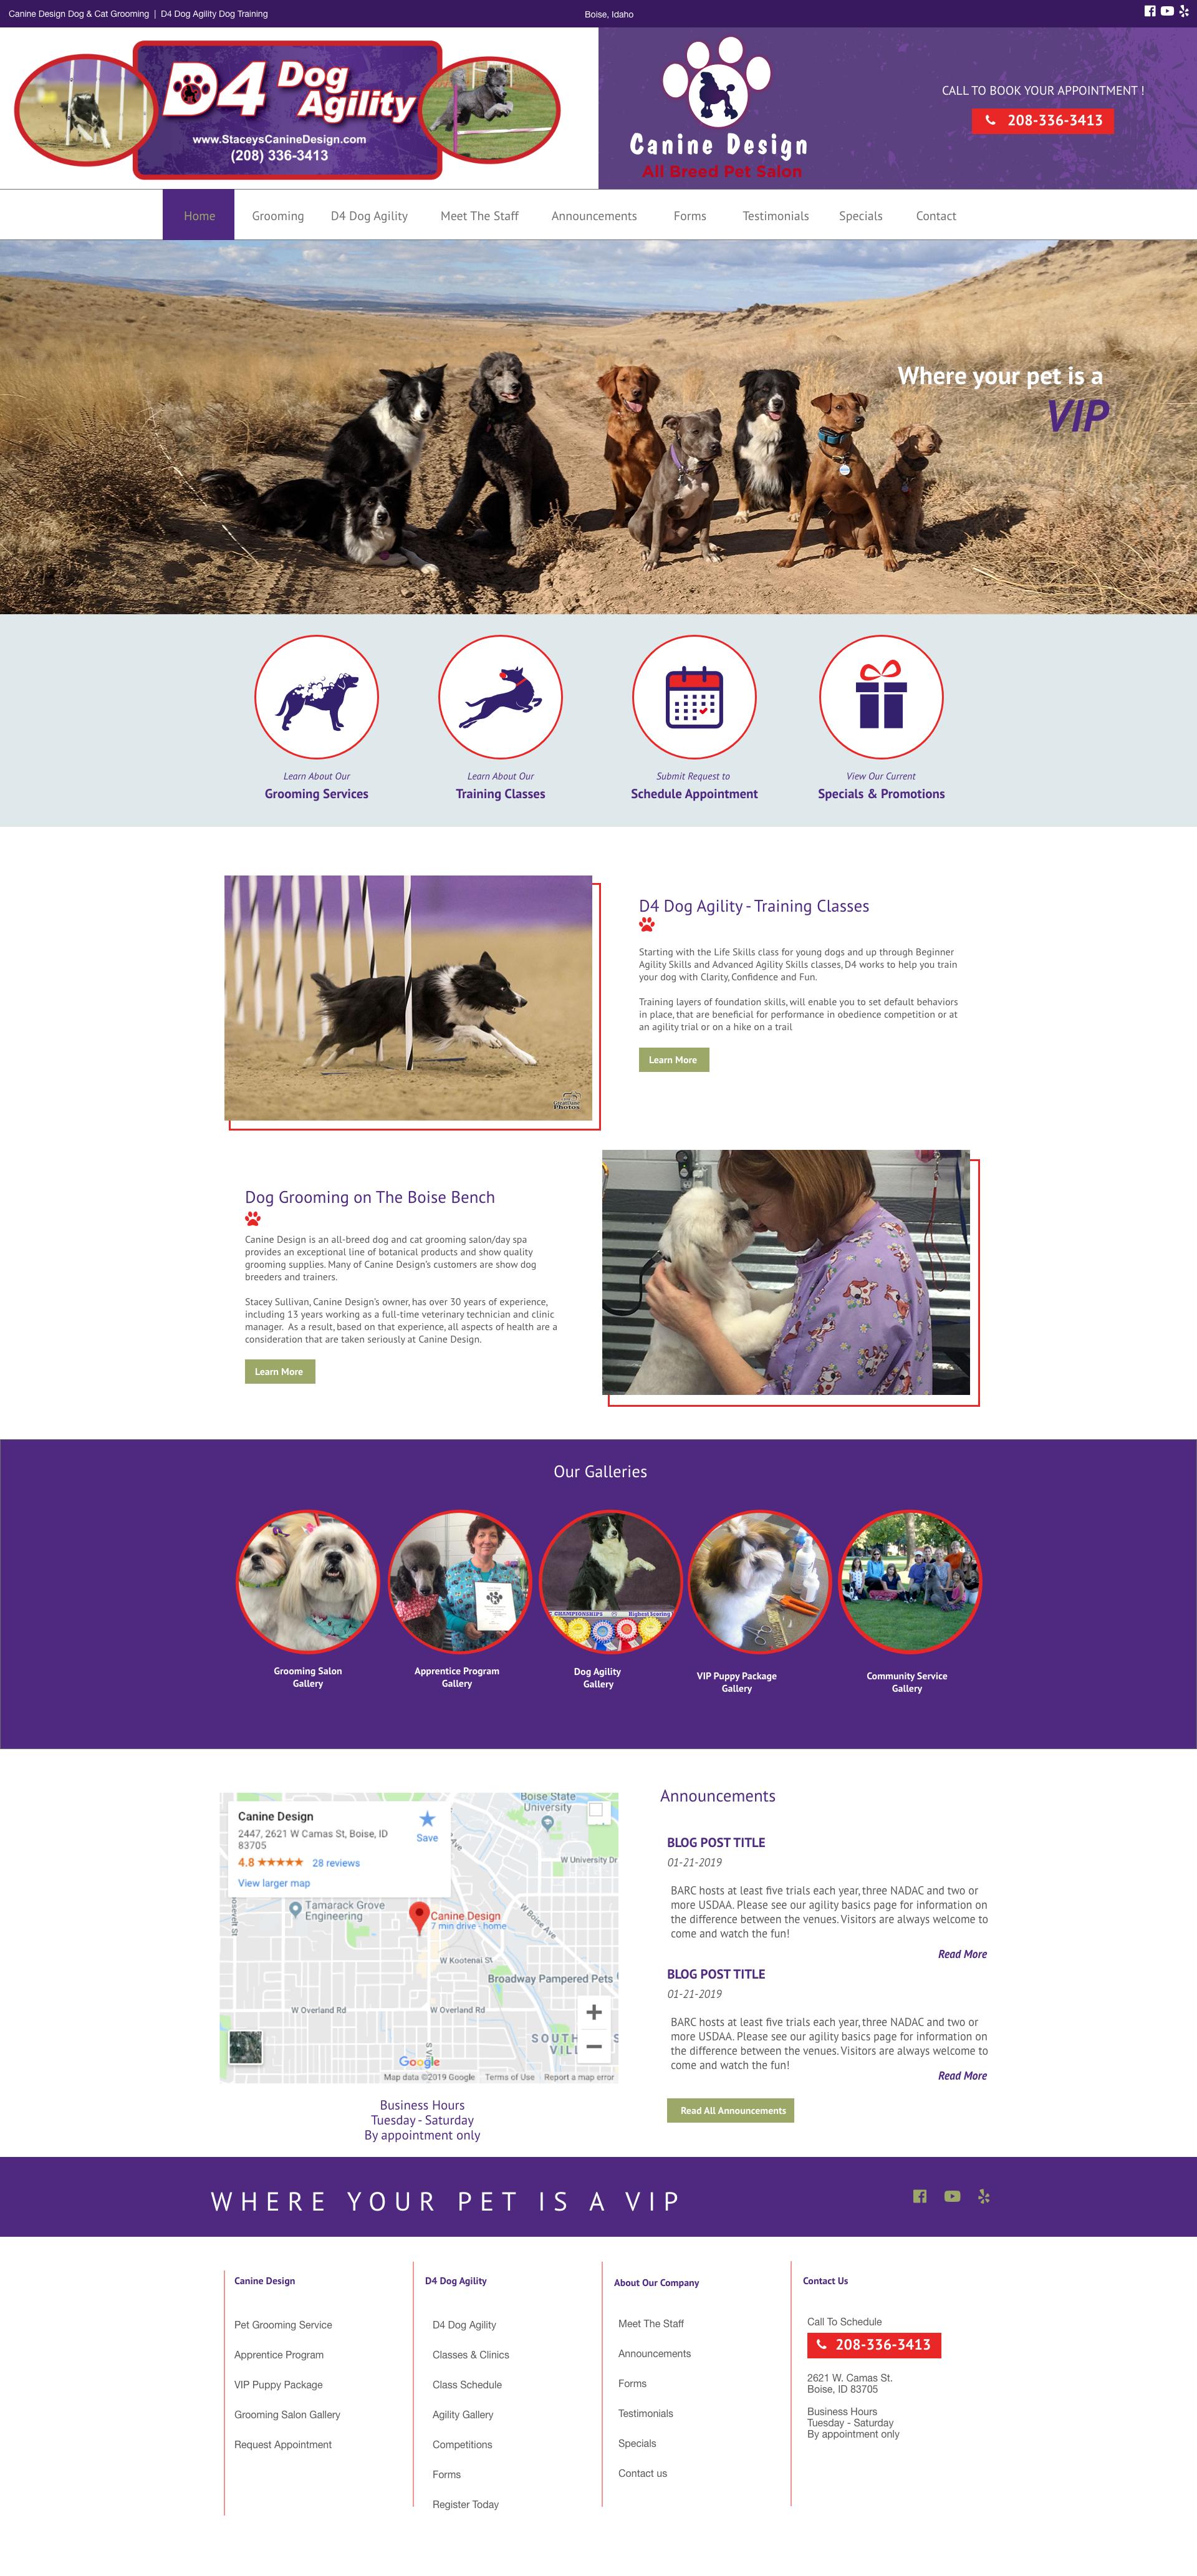 ID Canine Design Dog & Cat Grooming | D4 Dog Agility Dog ID